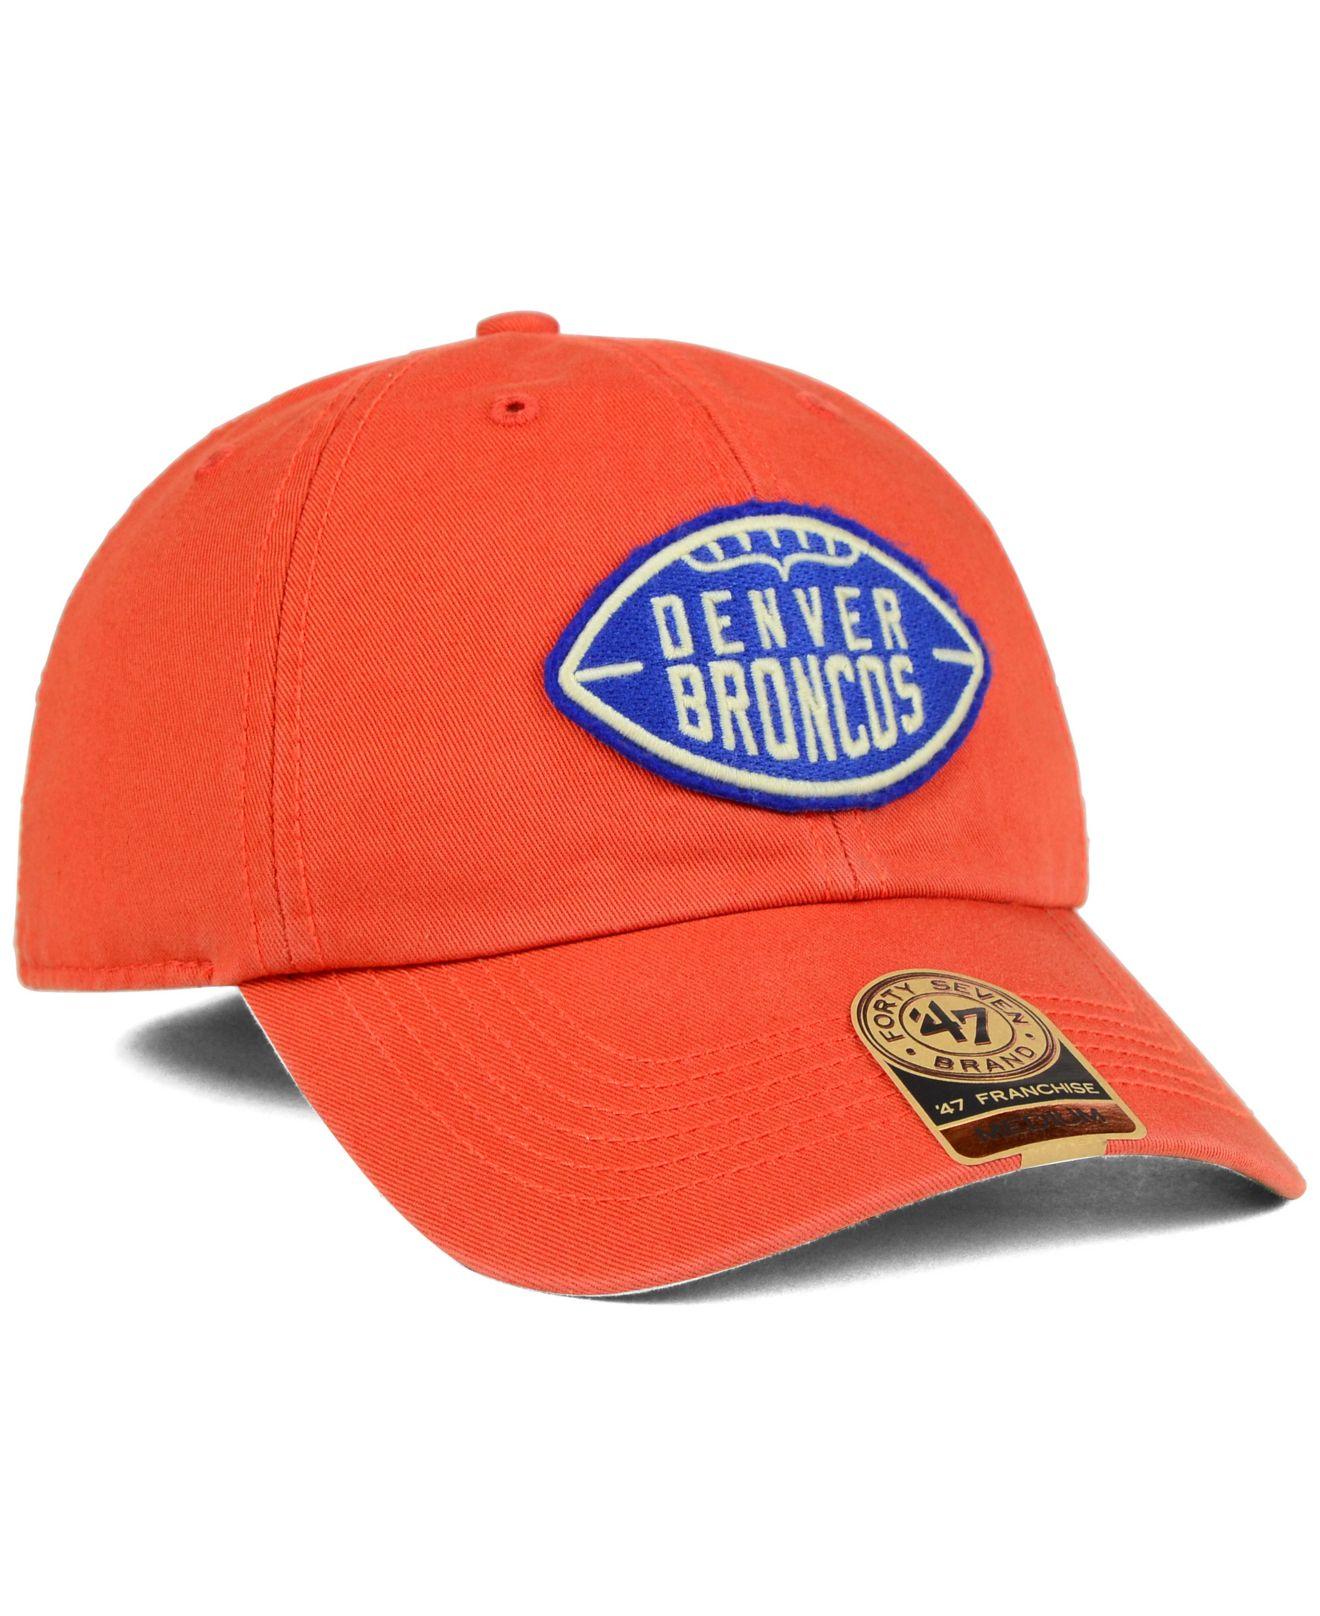 283008f2c2c85 Lyst - 47 Brand Denver Broncos Papa Franchise Cap in Orange for Men